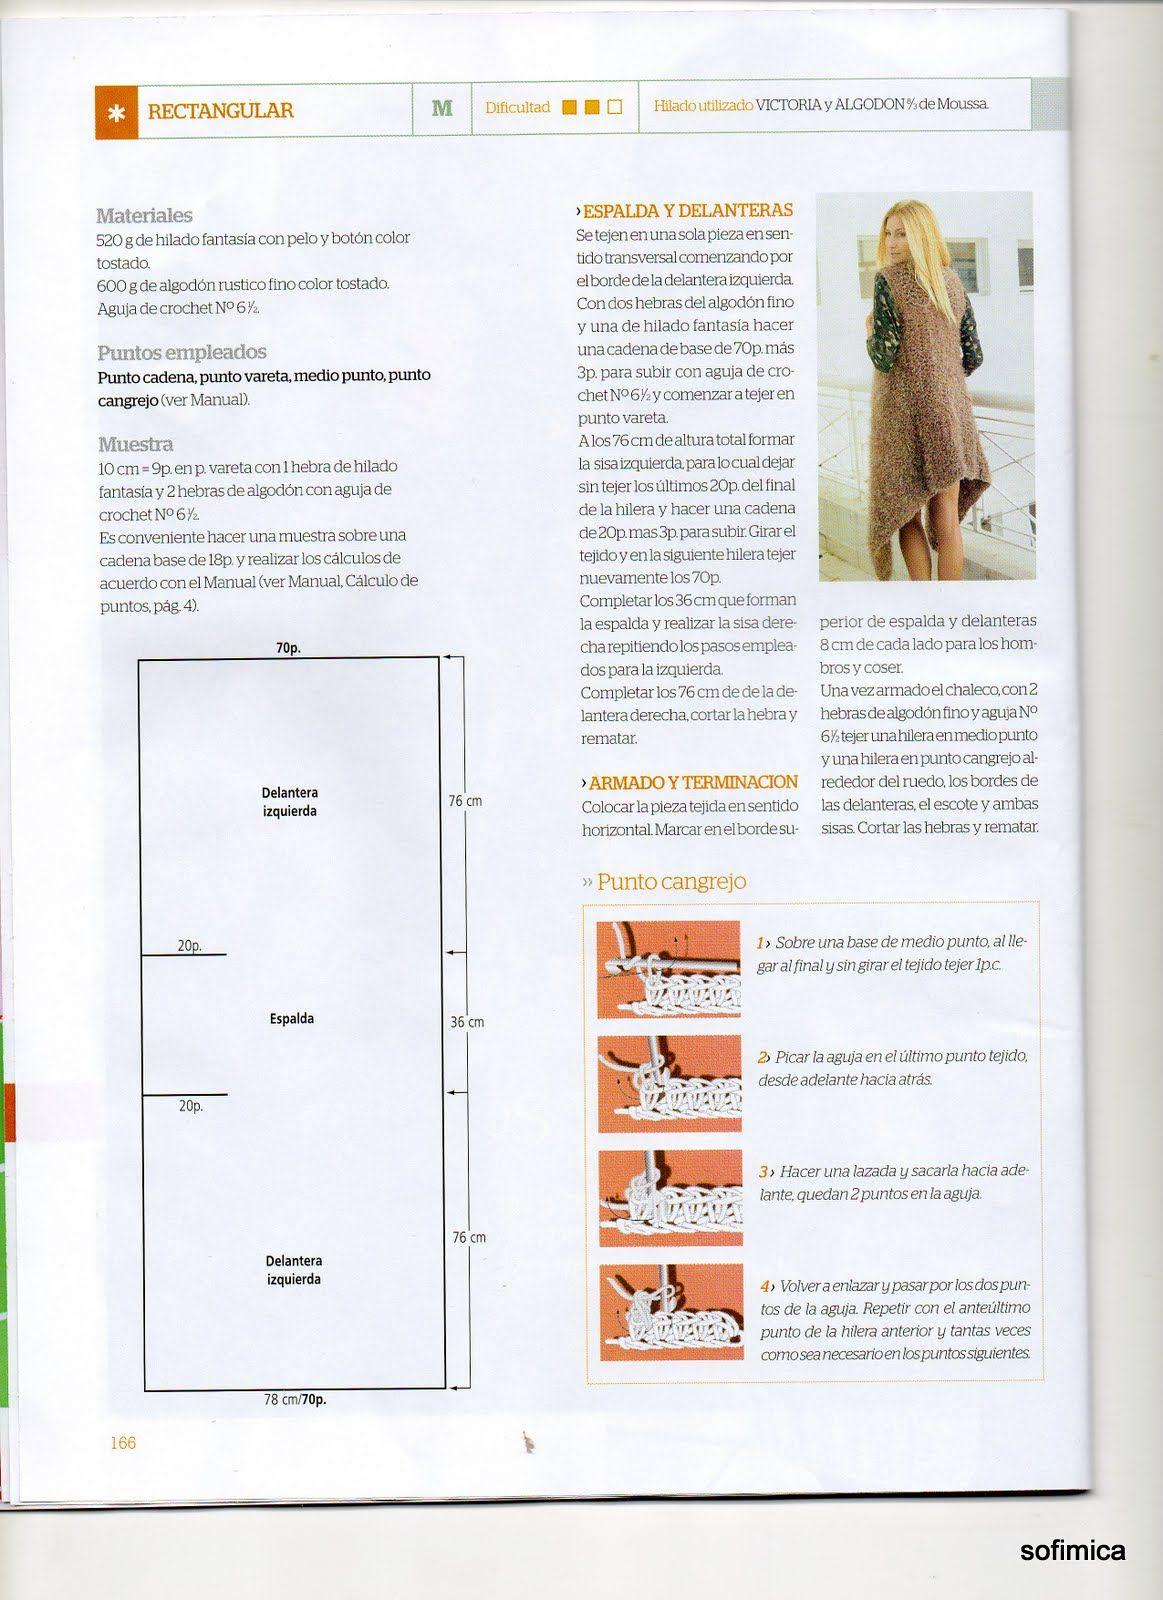 Pin de Fernanda Alba en Crochê | Pinterest | Aplicación y Ganchillo